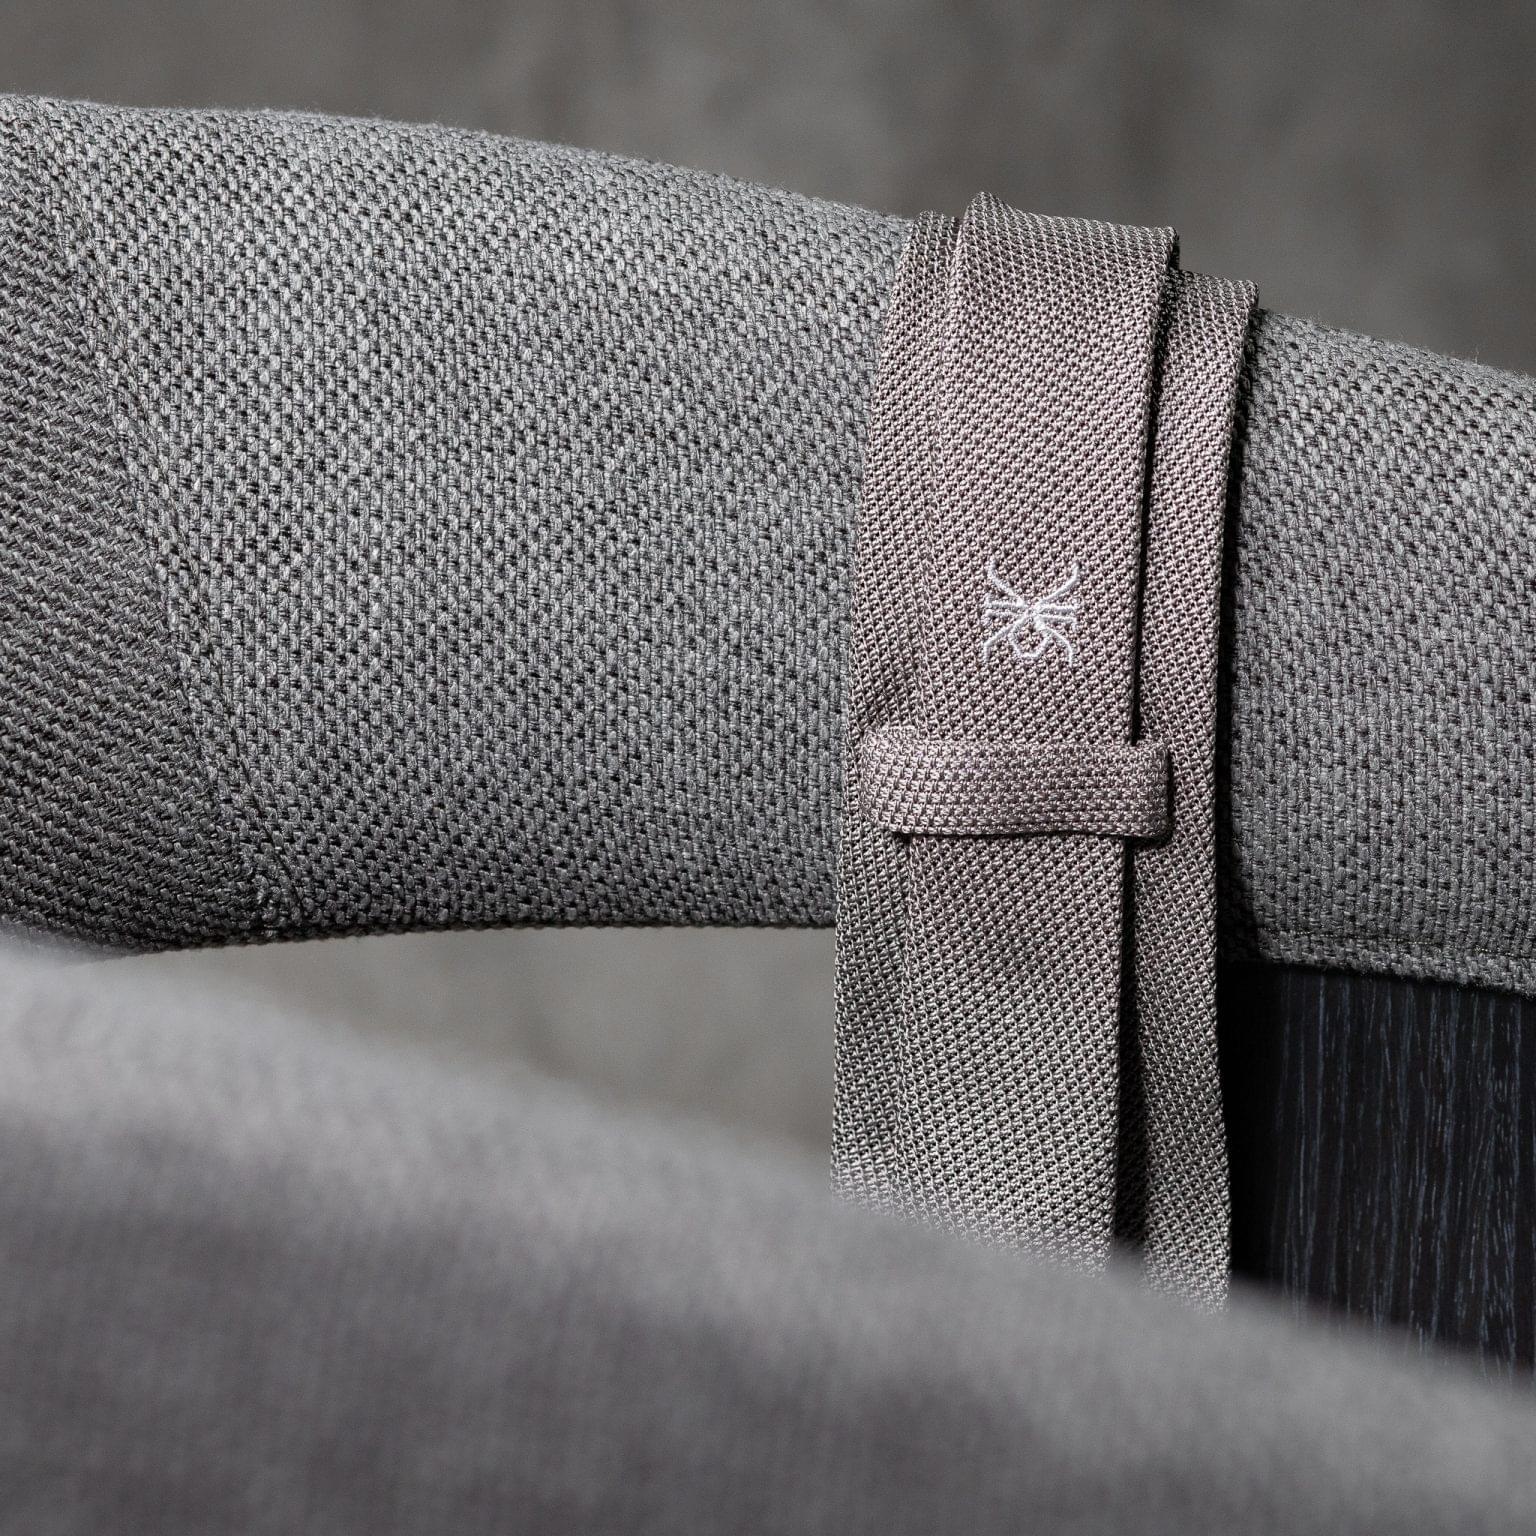 GRENADINE-0151-Tie-Initials-Corbata-Iniciale-The-Seelks-4